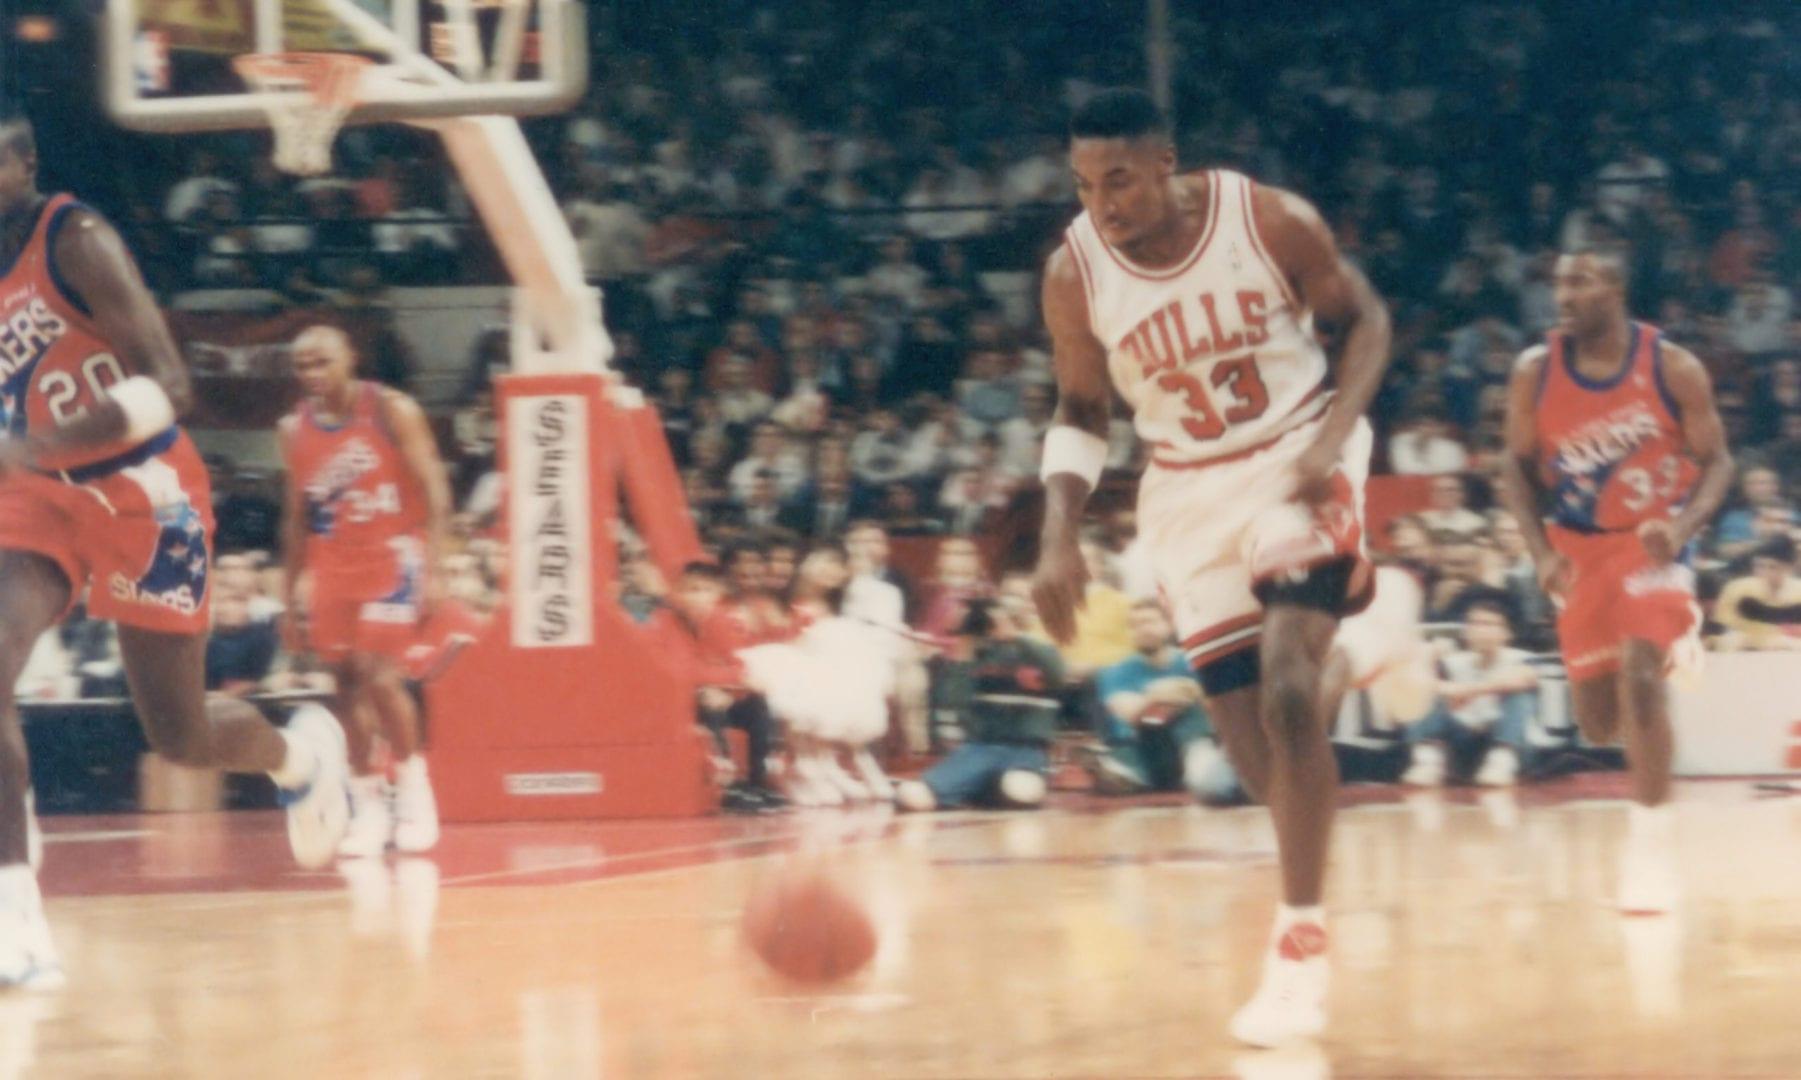 Scottie Pippen dribbling the ball